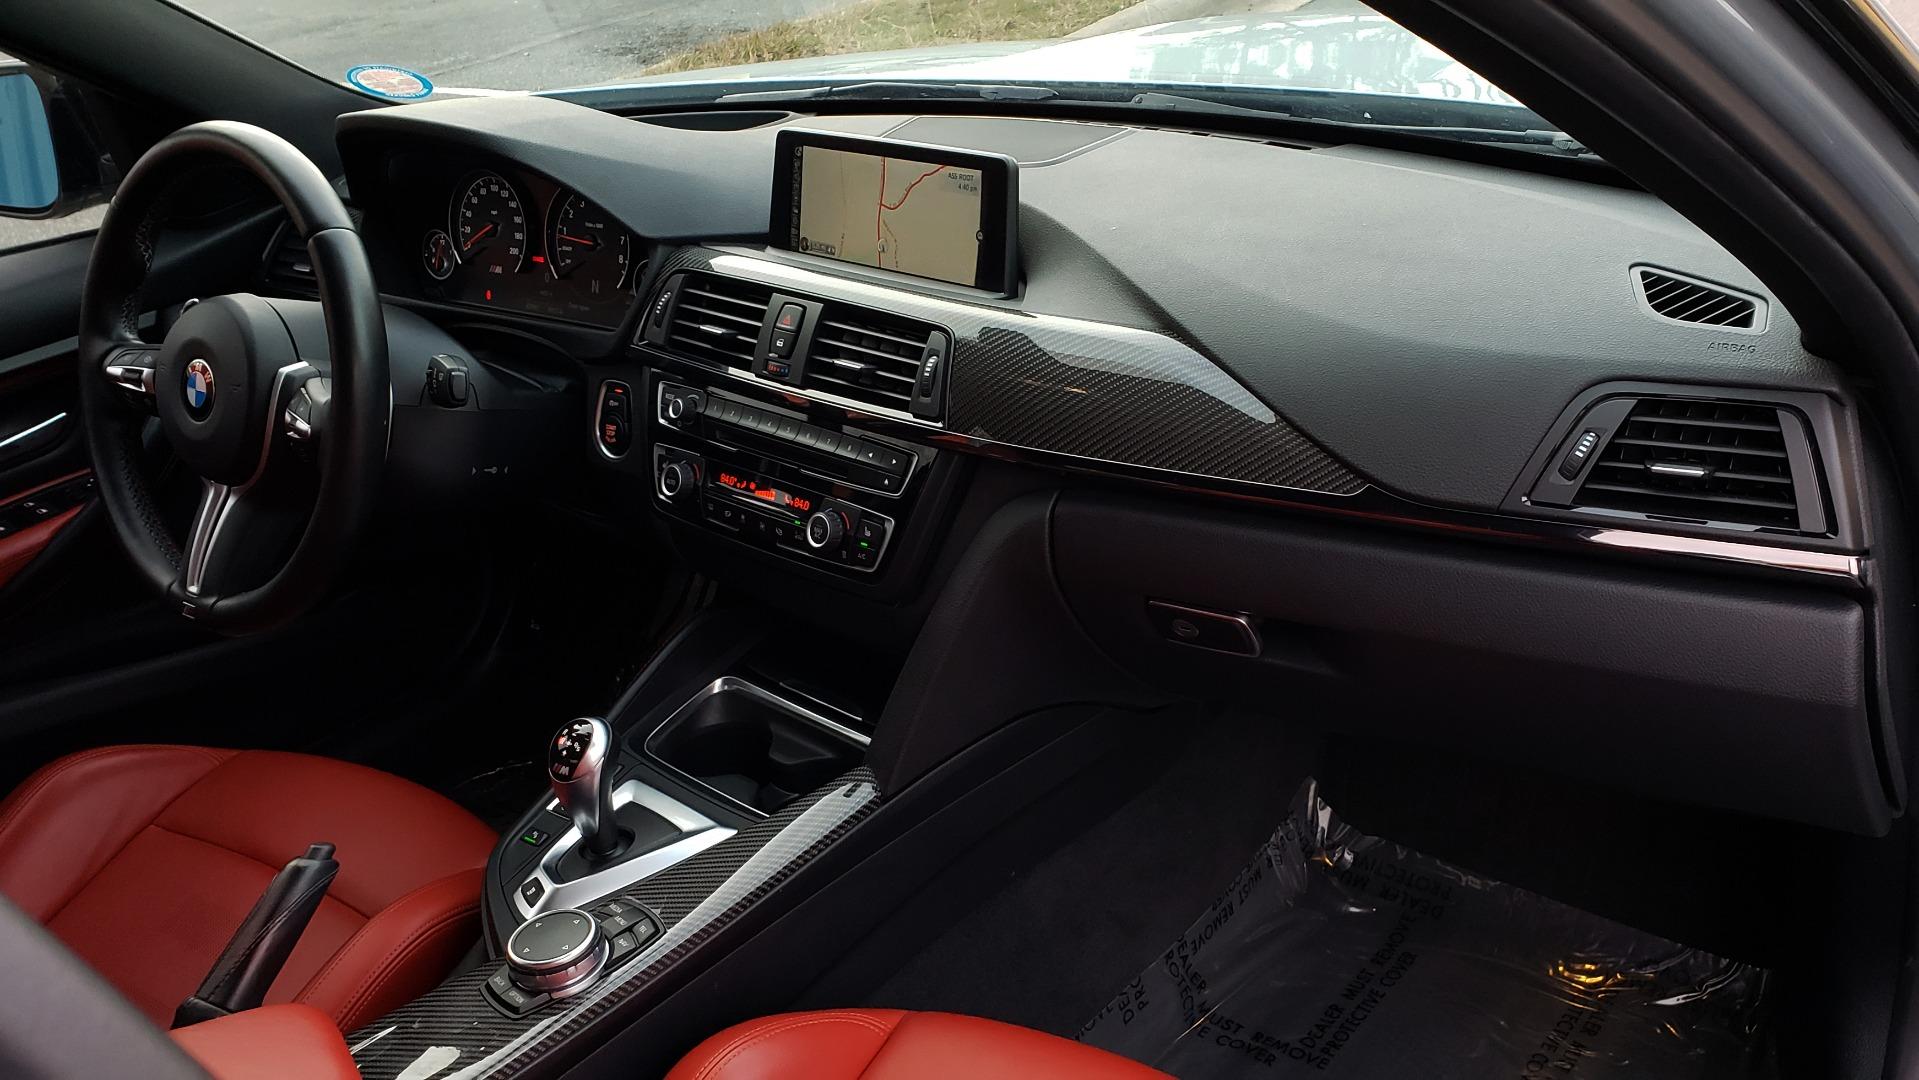 Used 2015 BMW M3 EXECUTIVE PKG / NAV / CAMERA / HUD / CARBON FIBER ROOF for sale Sold at Formula Imports in Charlotte NC 28227 80